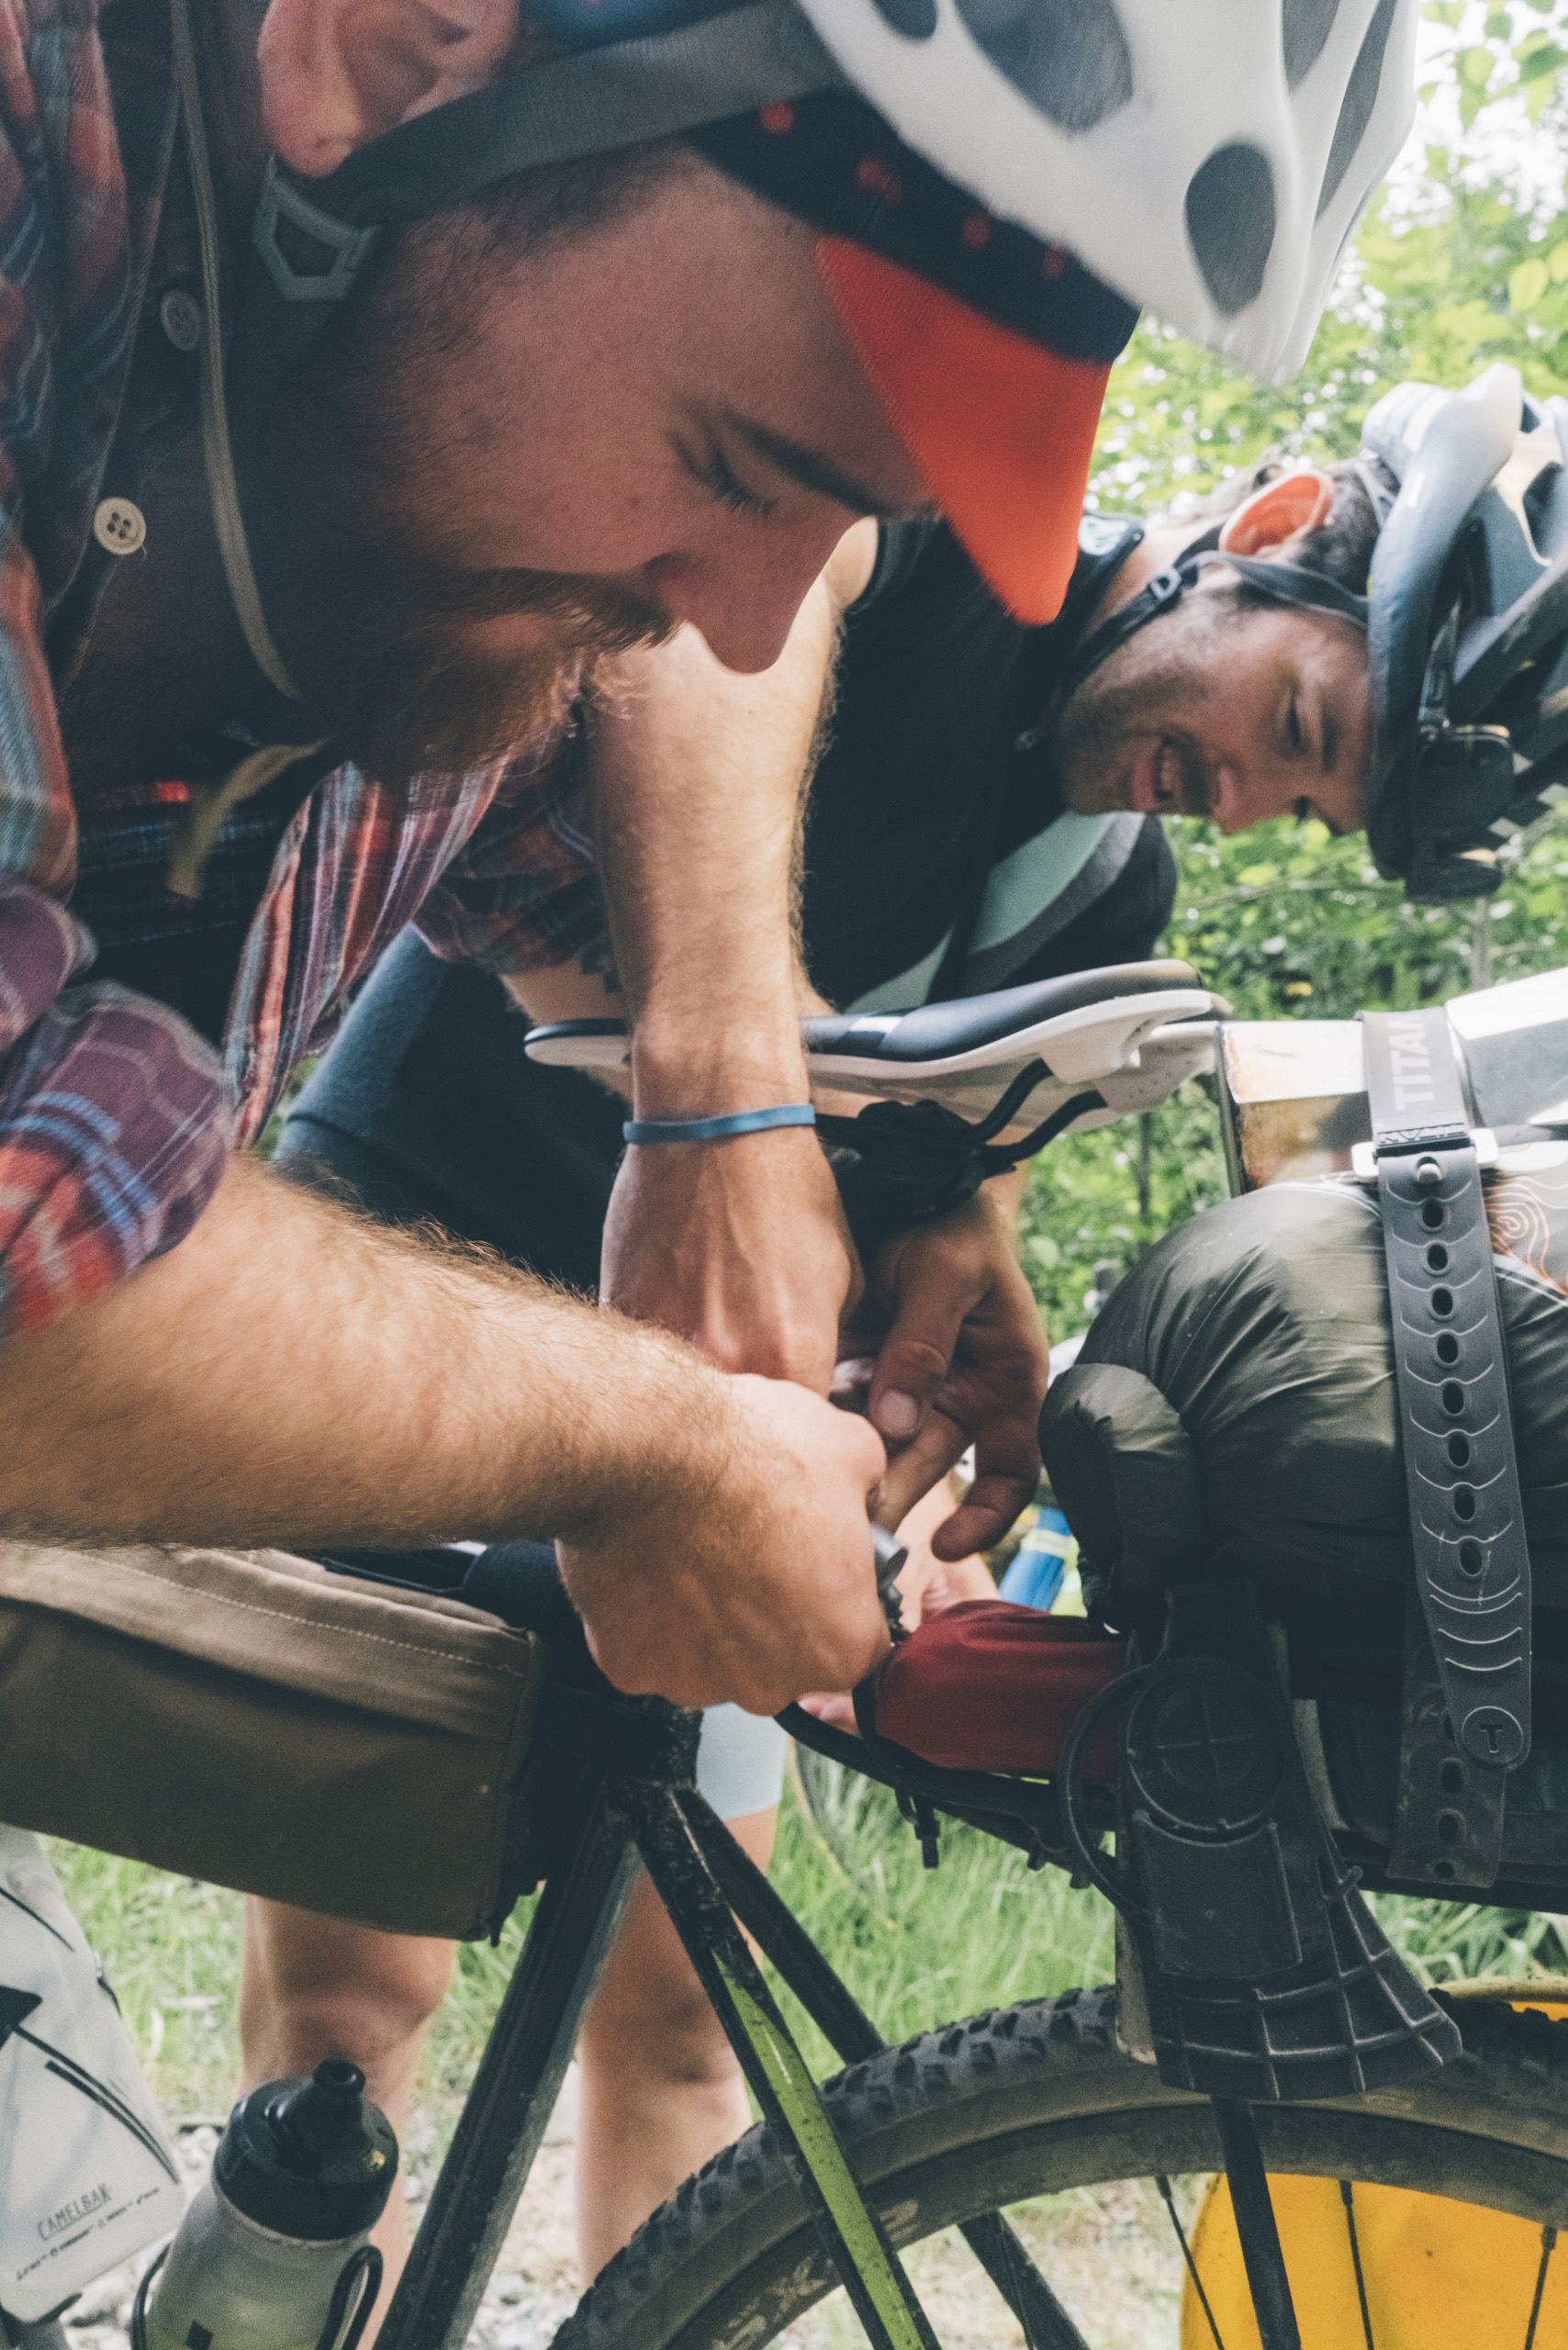 Bikepacking-VanIsland-JohnsonStudios-201806-277.jpg